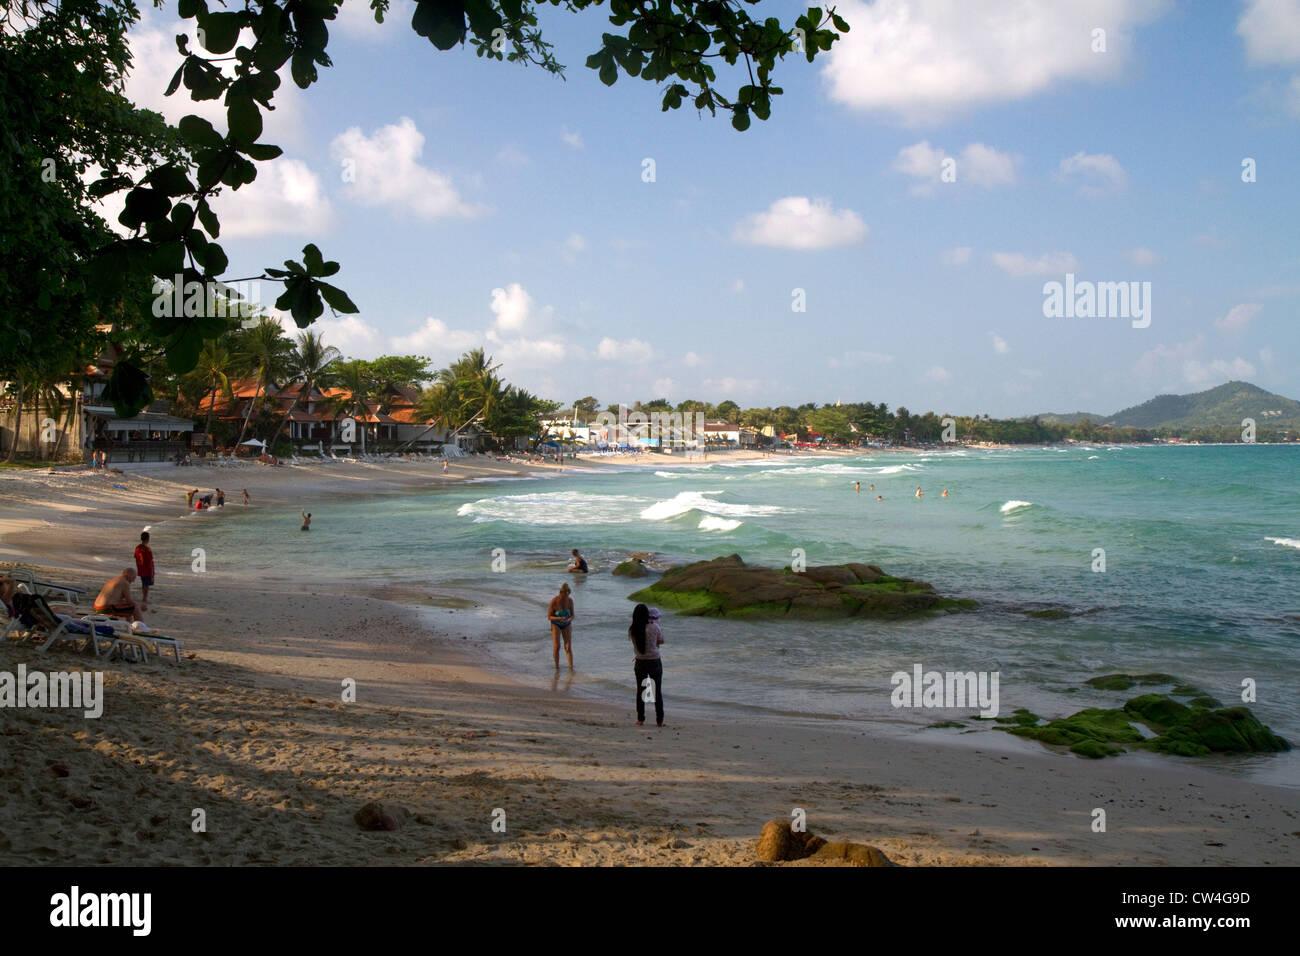 The Gulf of Thailand on the island of Ko Samui, Thailand. - Stock Image